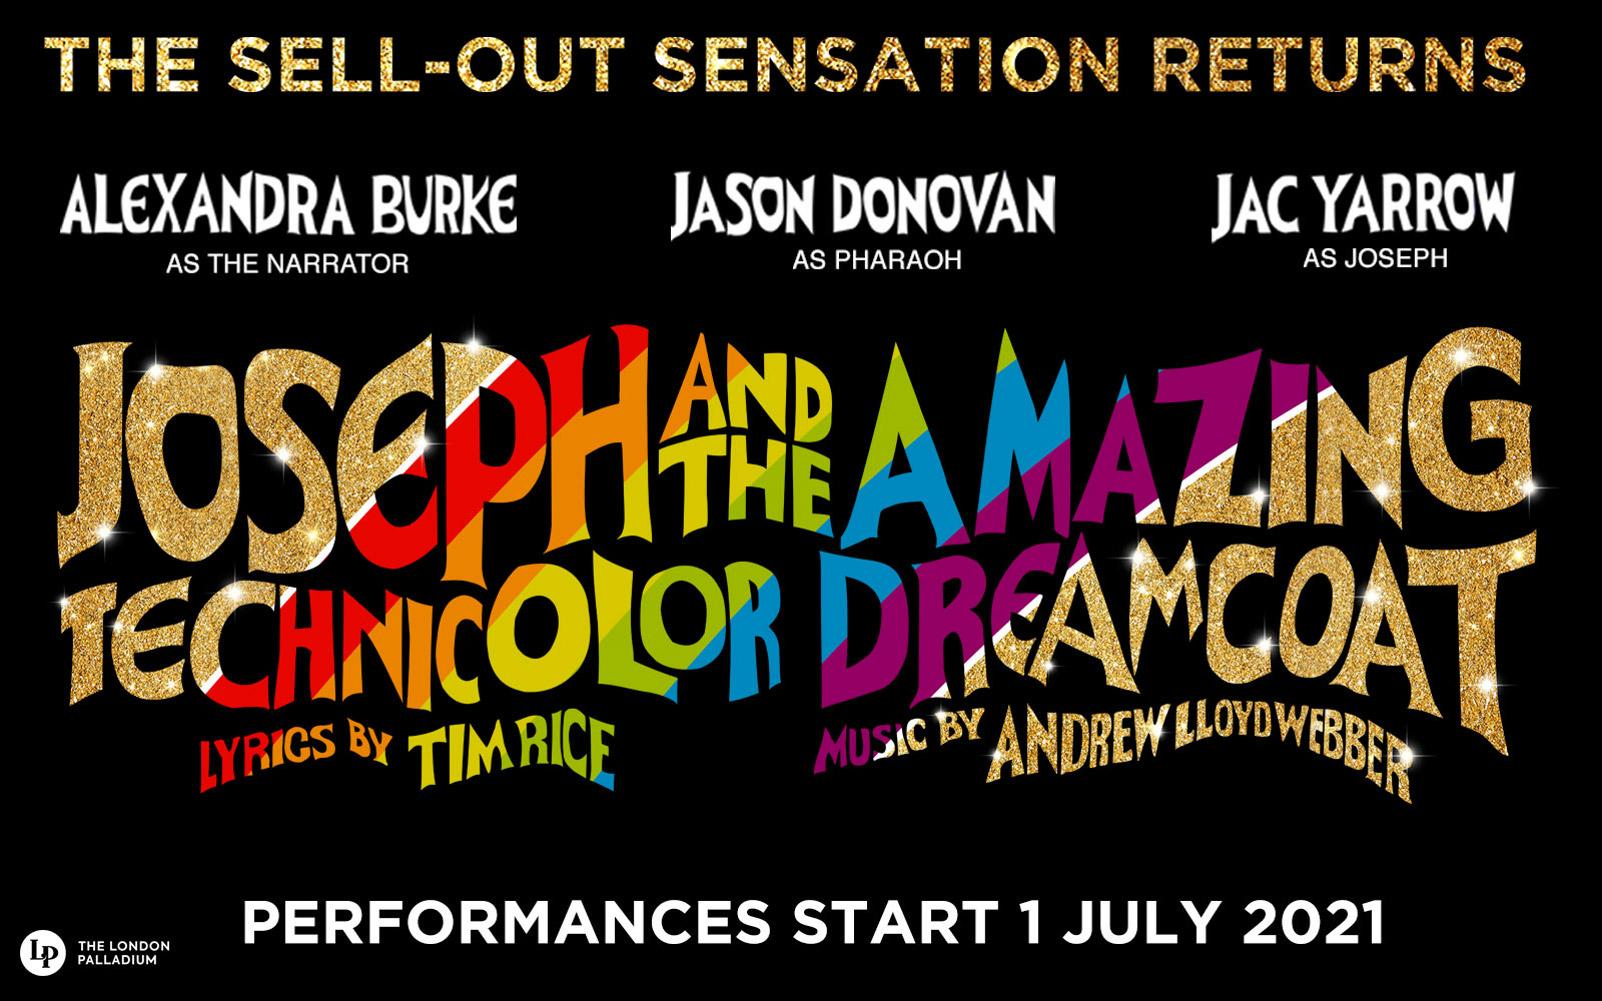 Performances start July 1st 2021